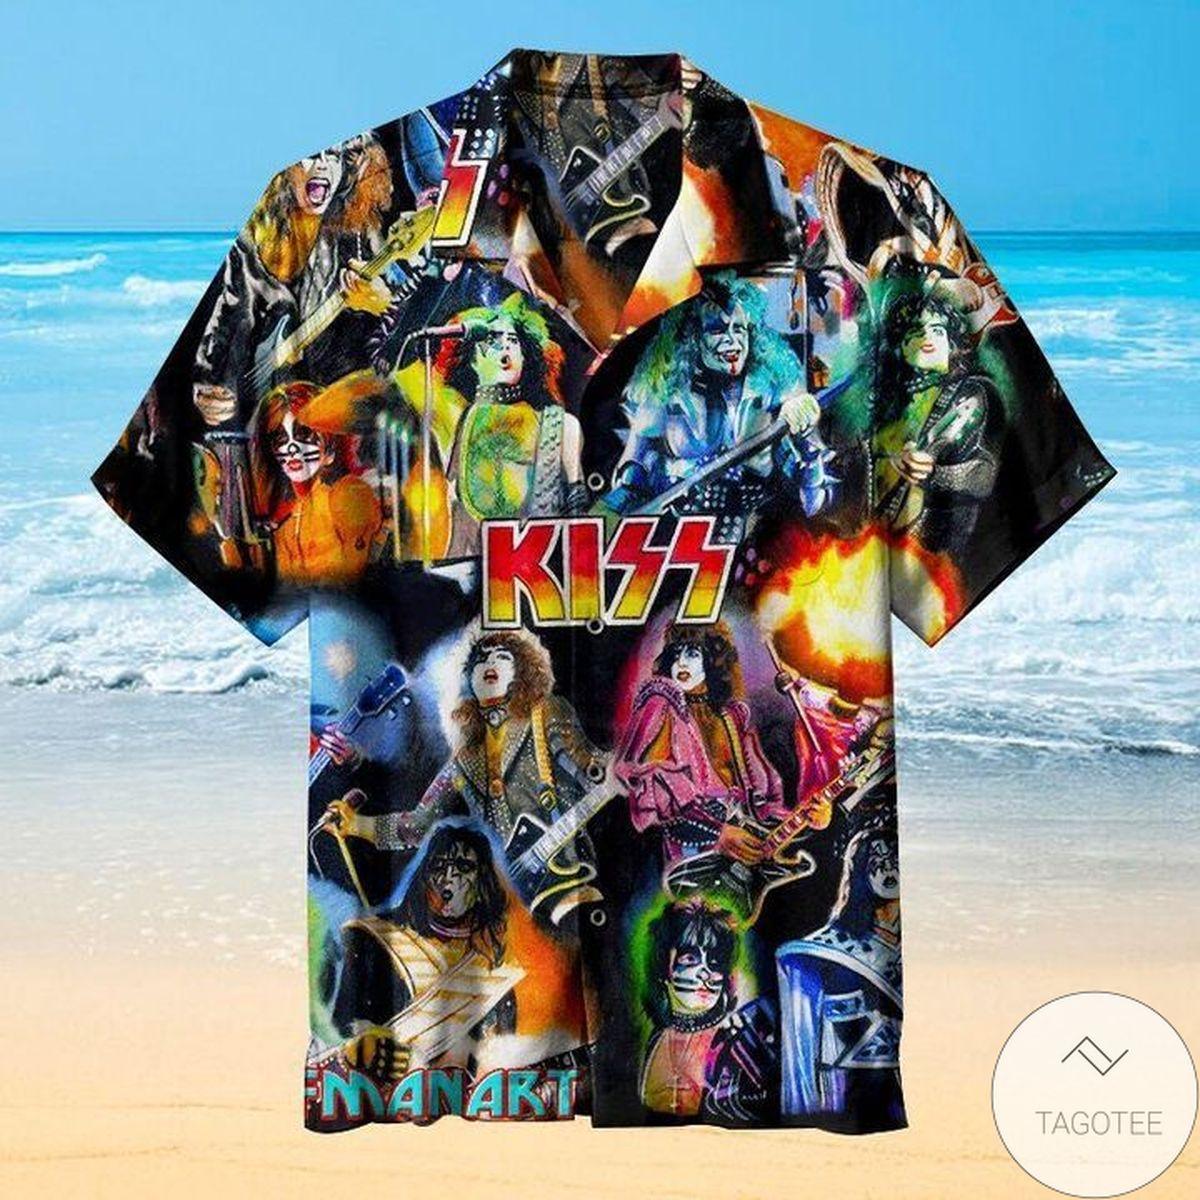 Unisex Kiss Manaki Hawaiian Shirt